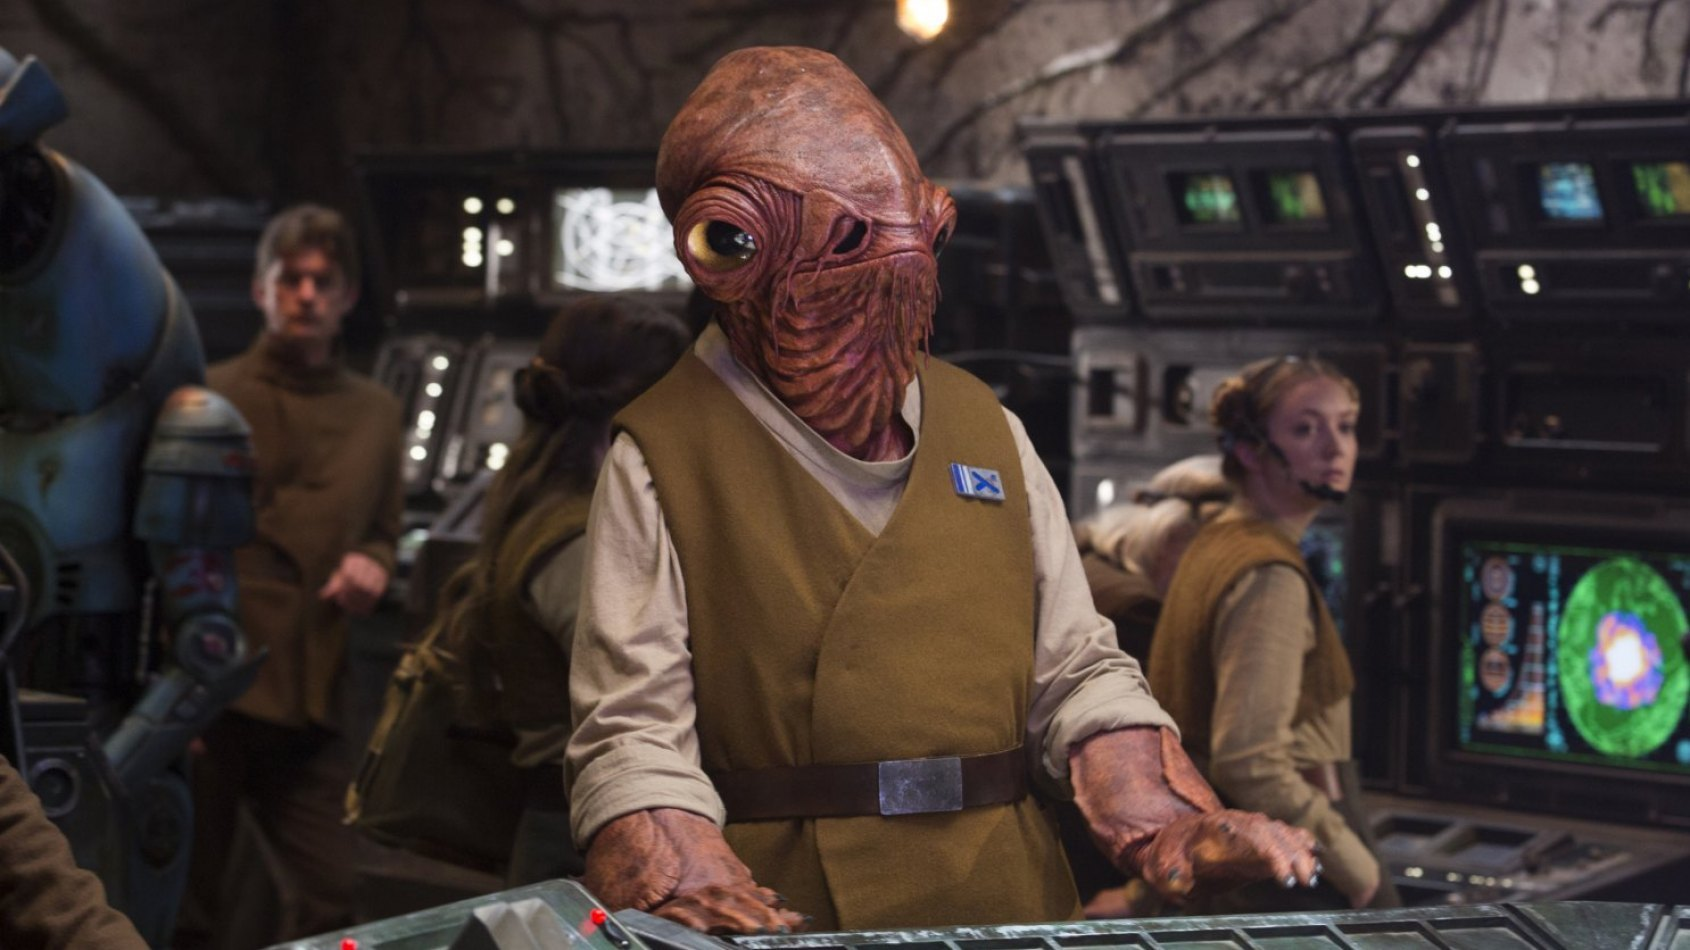 Une sortie Plan�te Star Wars � la rencontre de l'Amiral Ackbar !